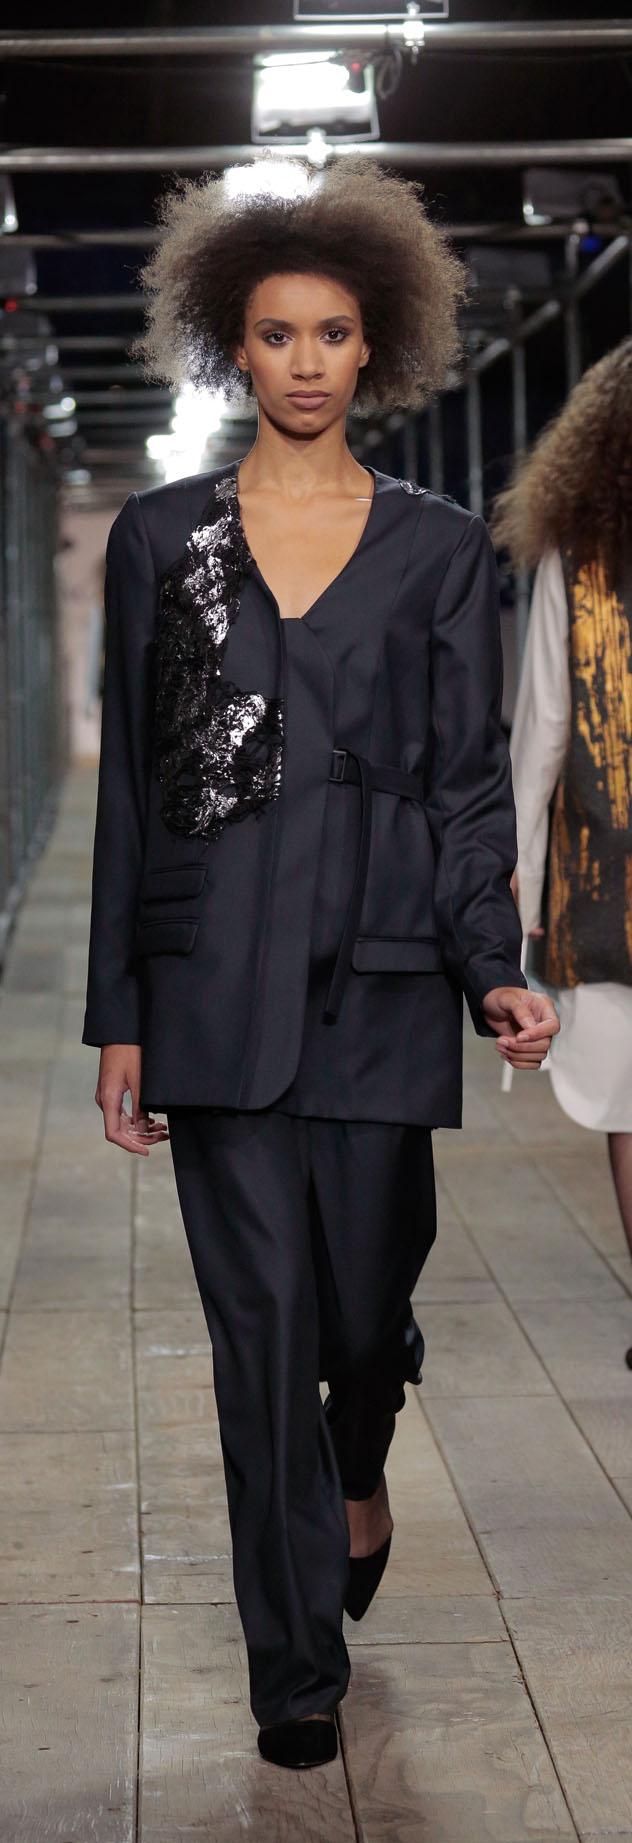 61_Denise Ramos, fashion design and Jorge Iglesias, textile design_CROPPED.jpg